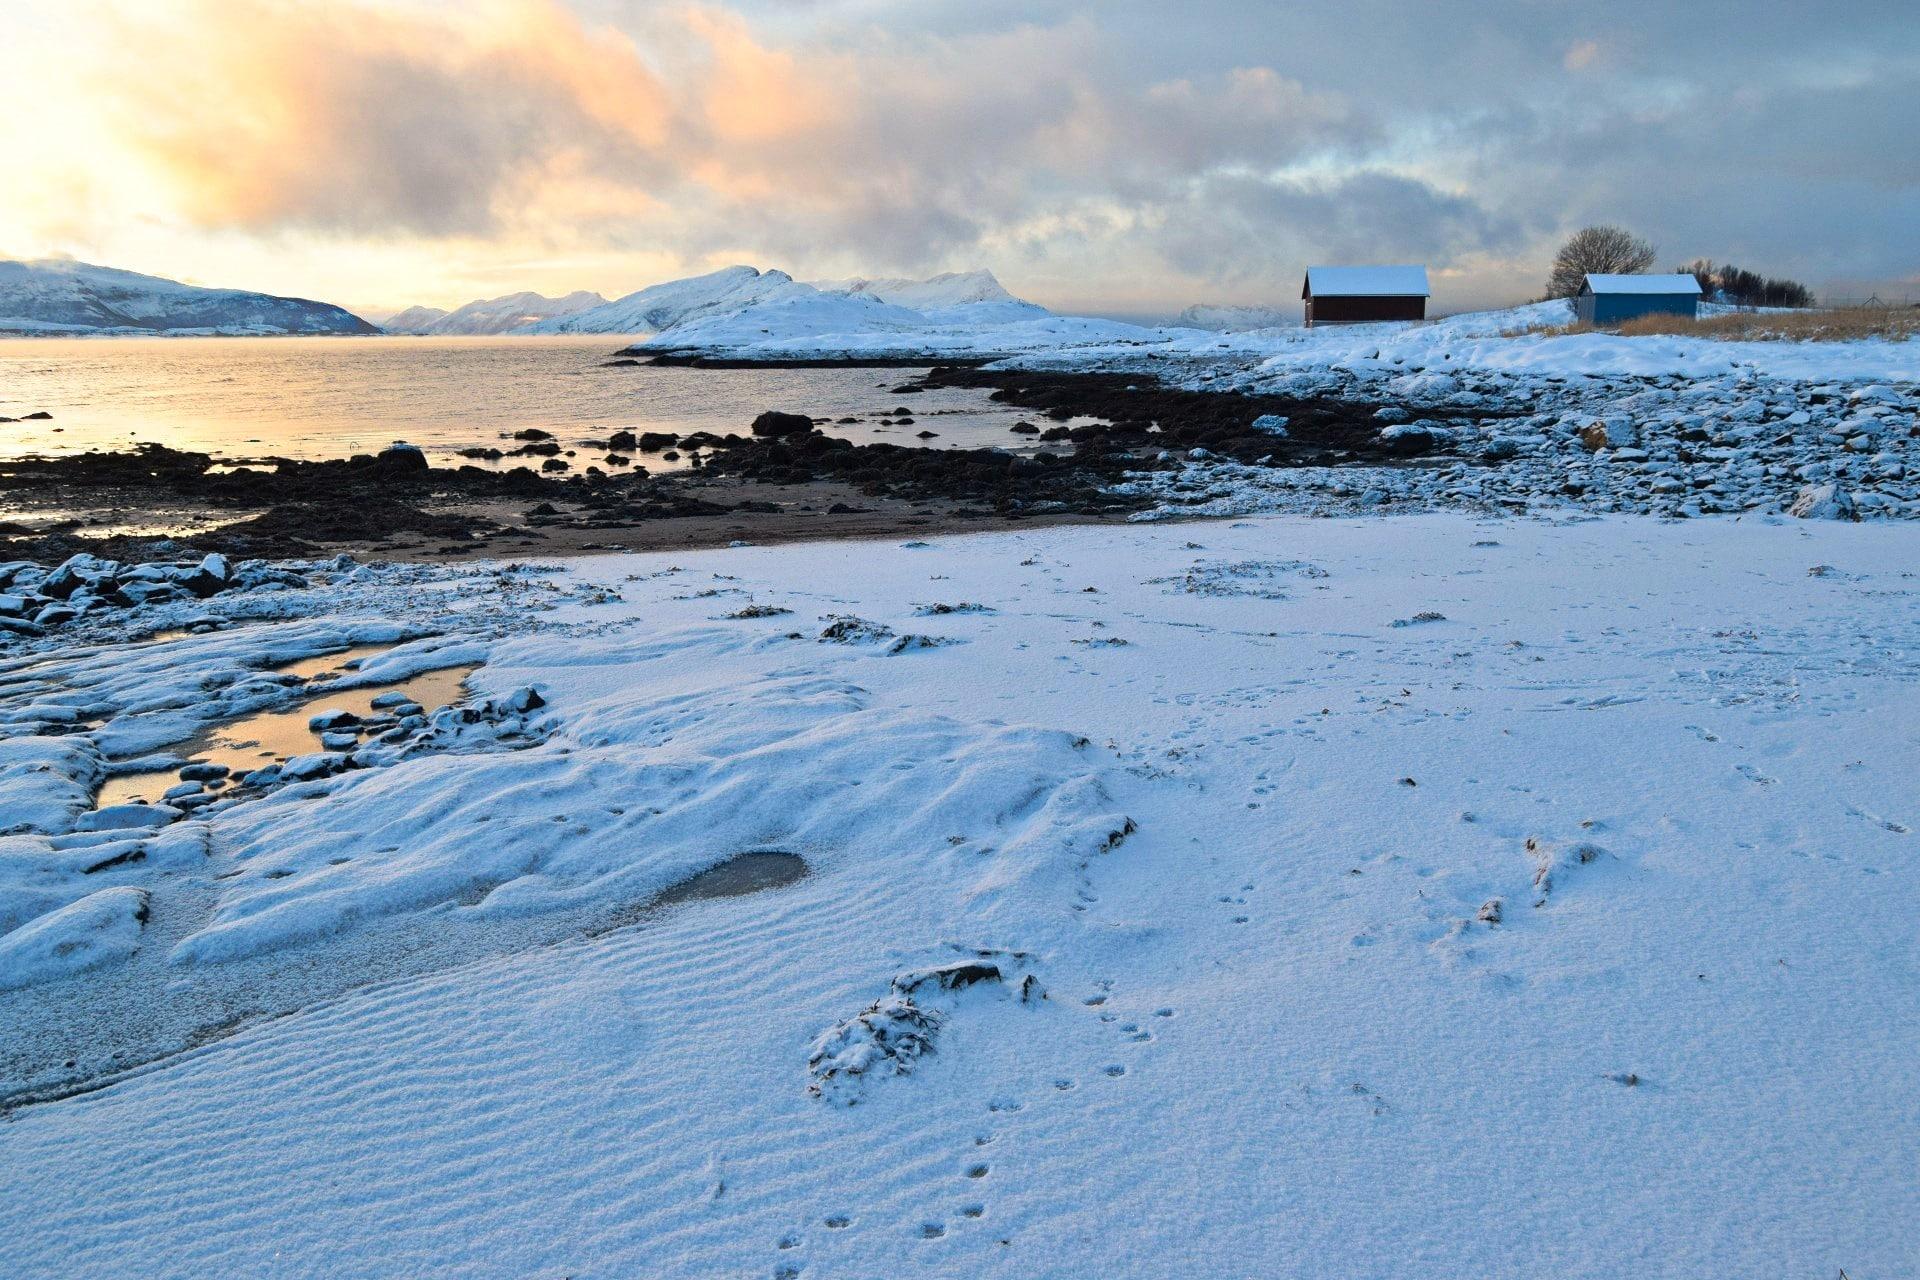 Kald vinterdag i fjæra ved Bodøsjøen